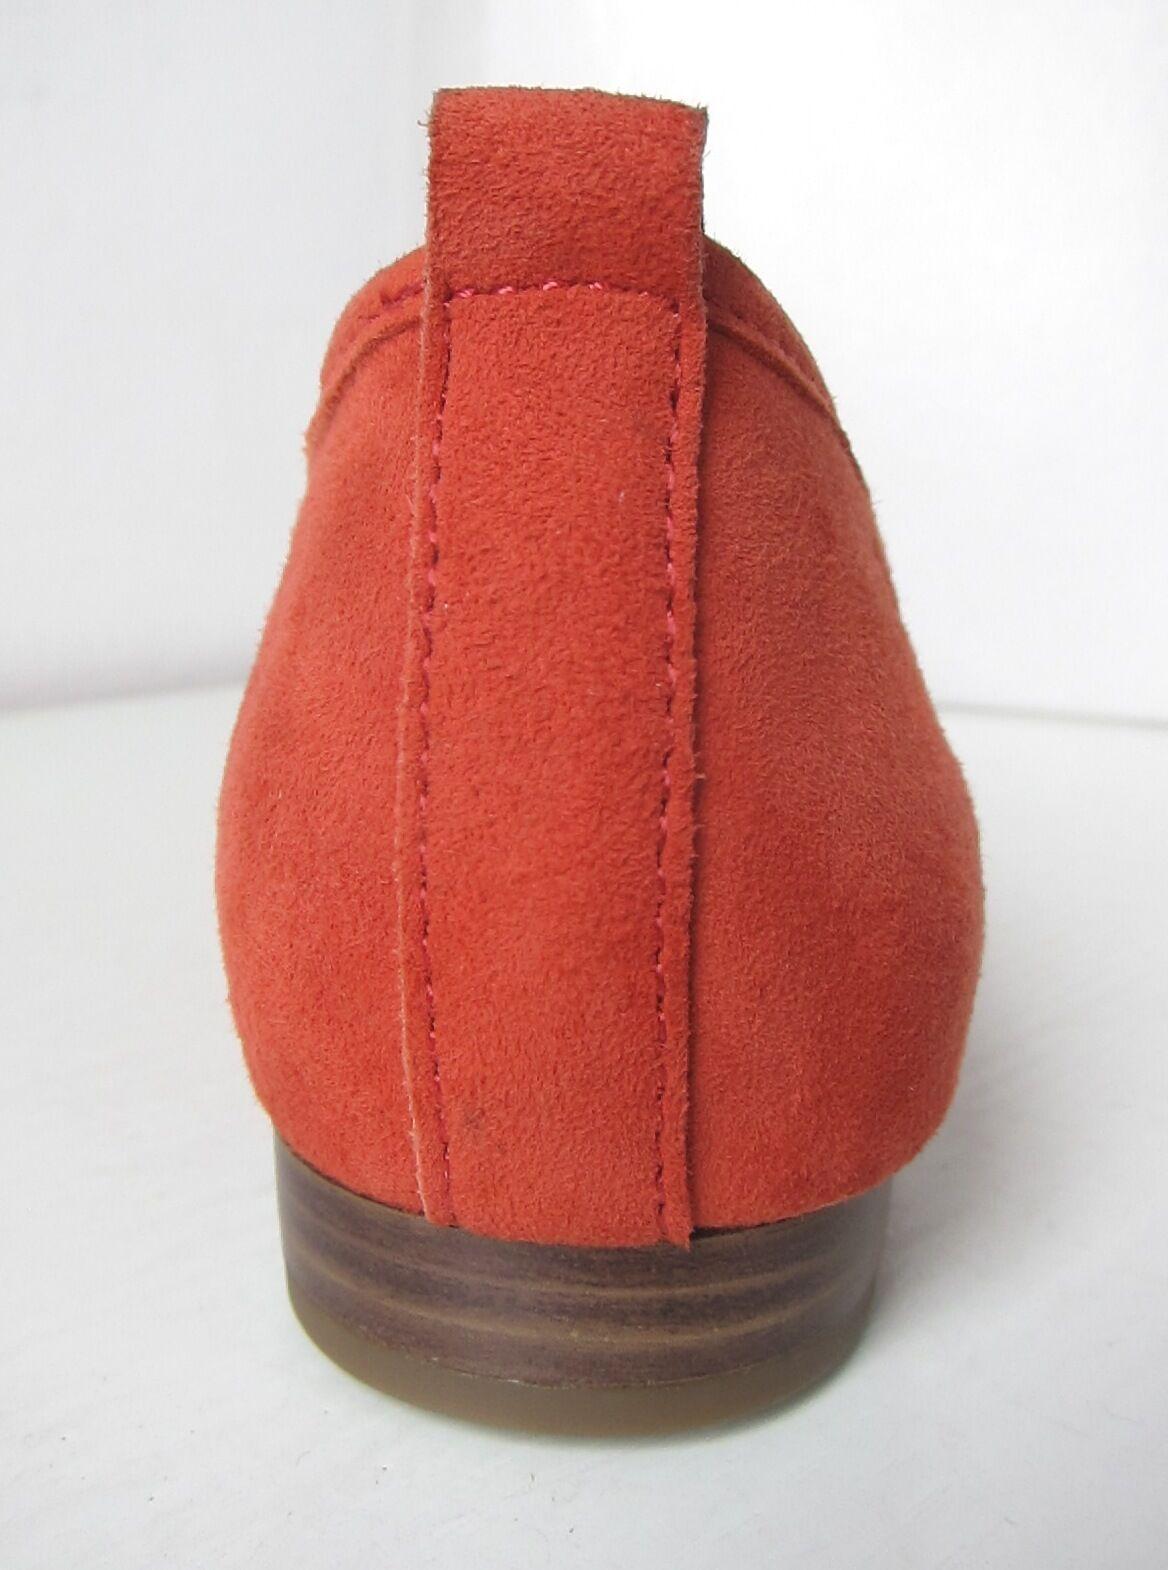 Tamaris Wildleder Ballerina Wildleder Tamaris mandarin Gr 39 suede schuhe orange ballerinas birago e5b1c9